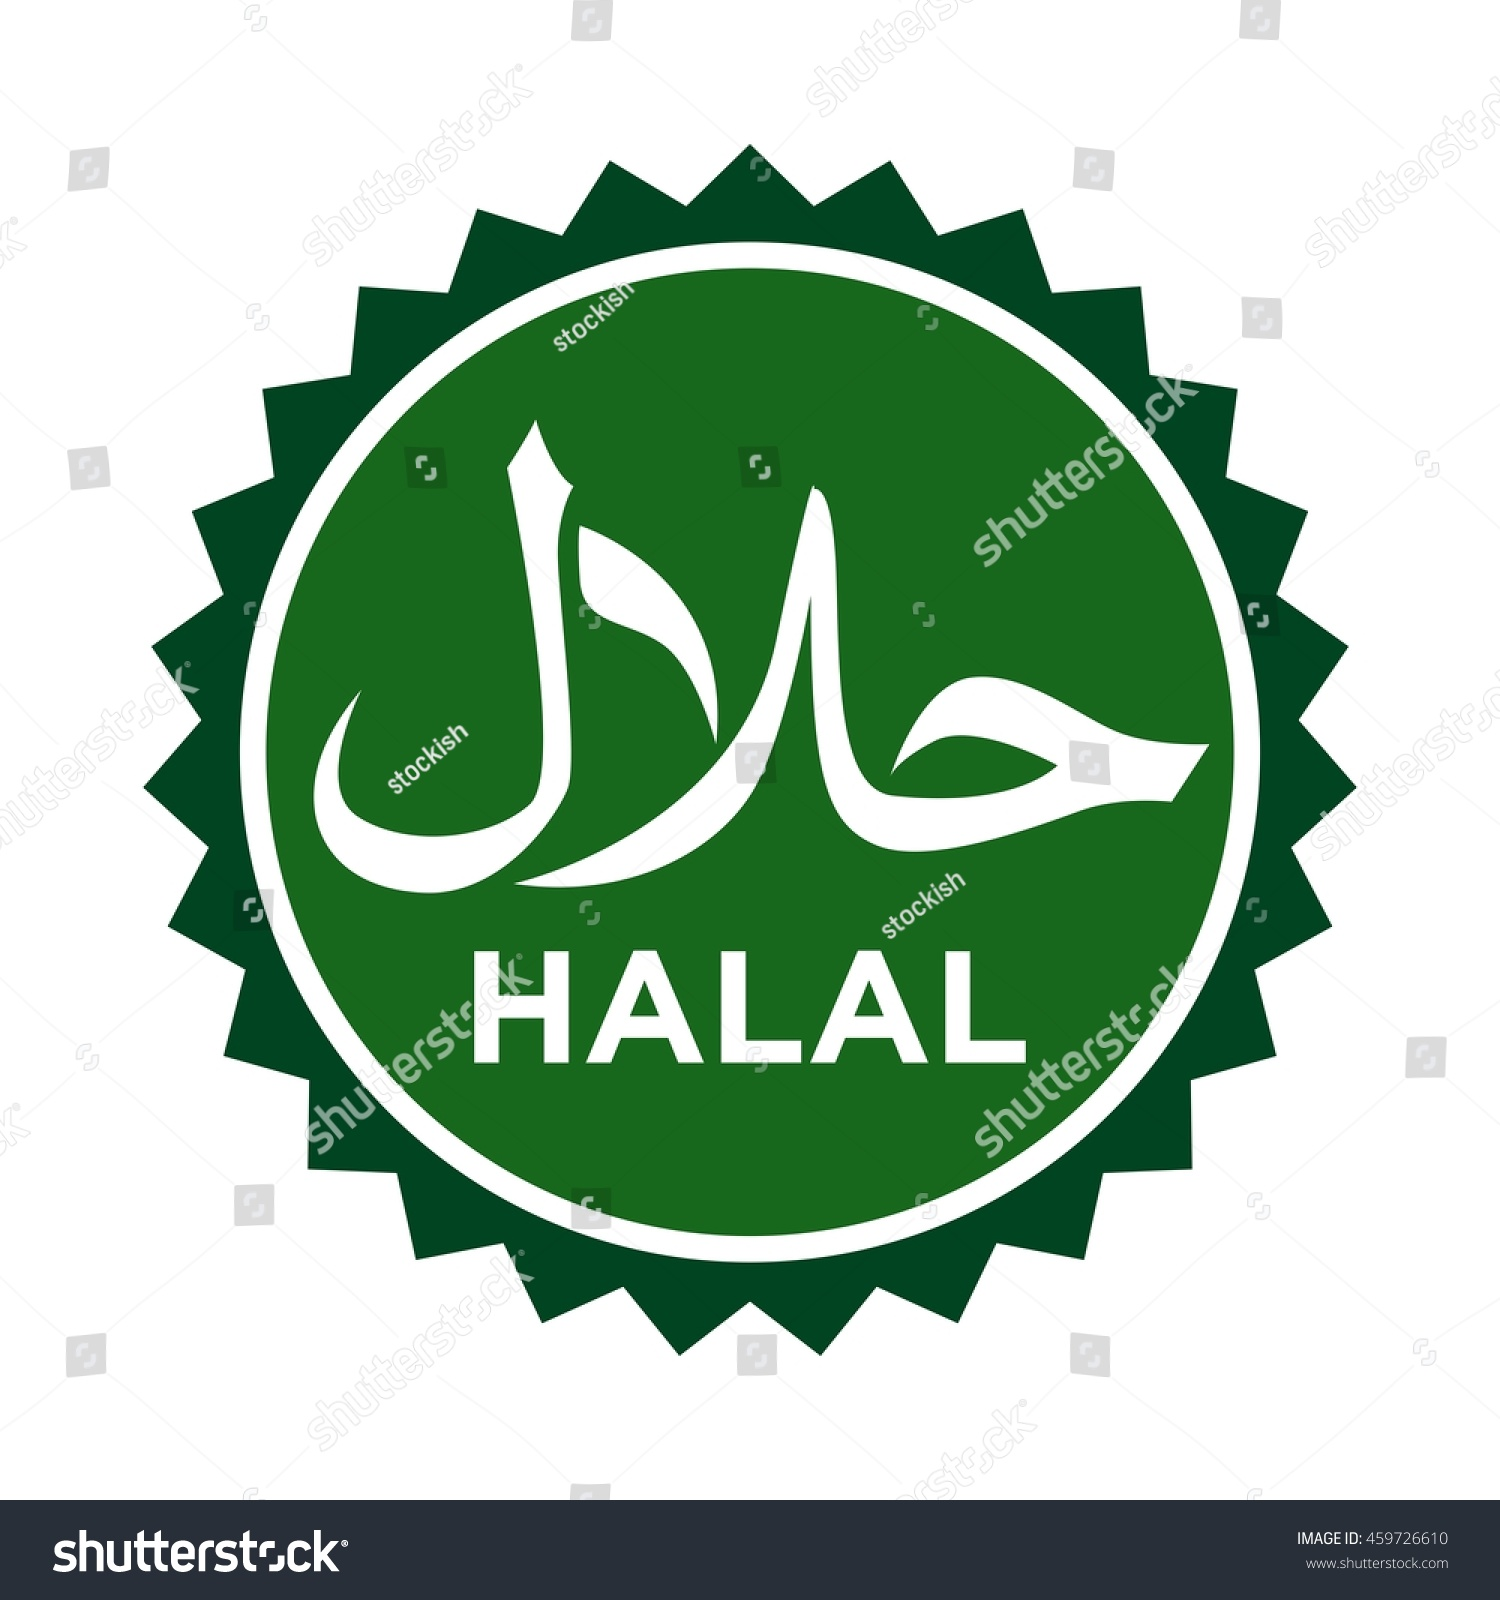 Halal Logo Vector Halal Emblem Stock Vector  Shutterstock